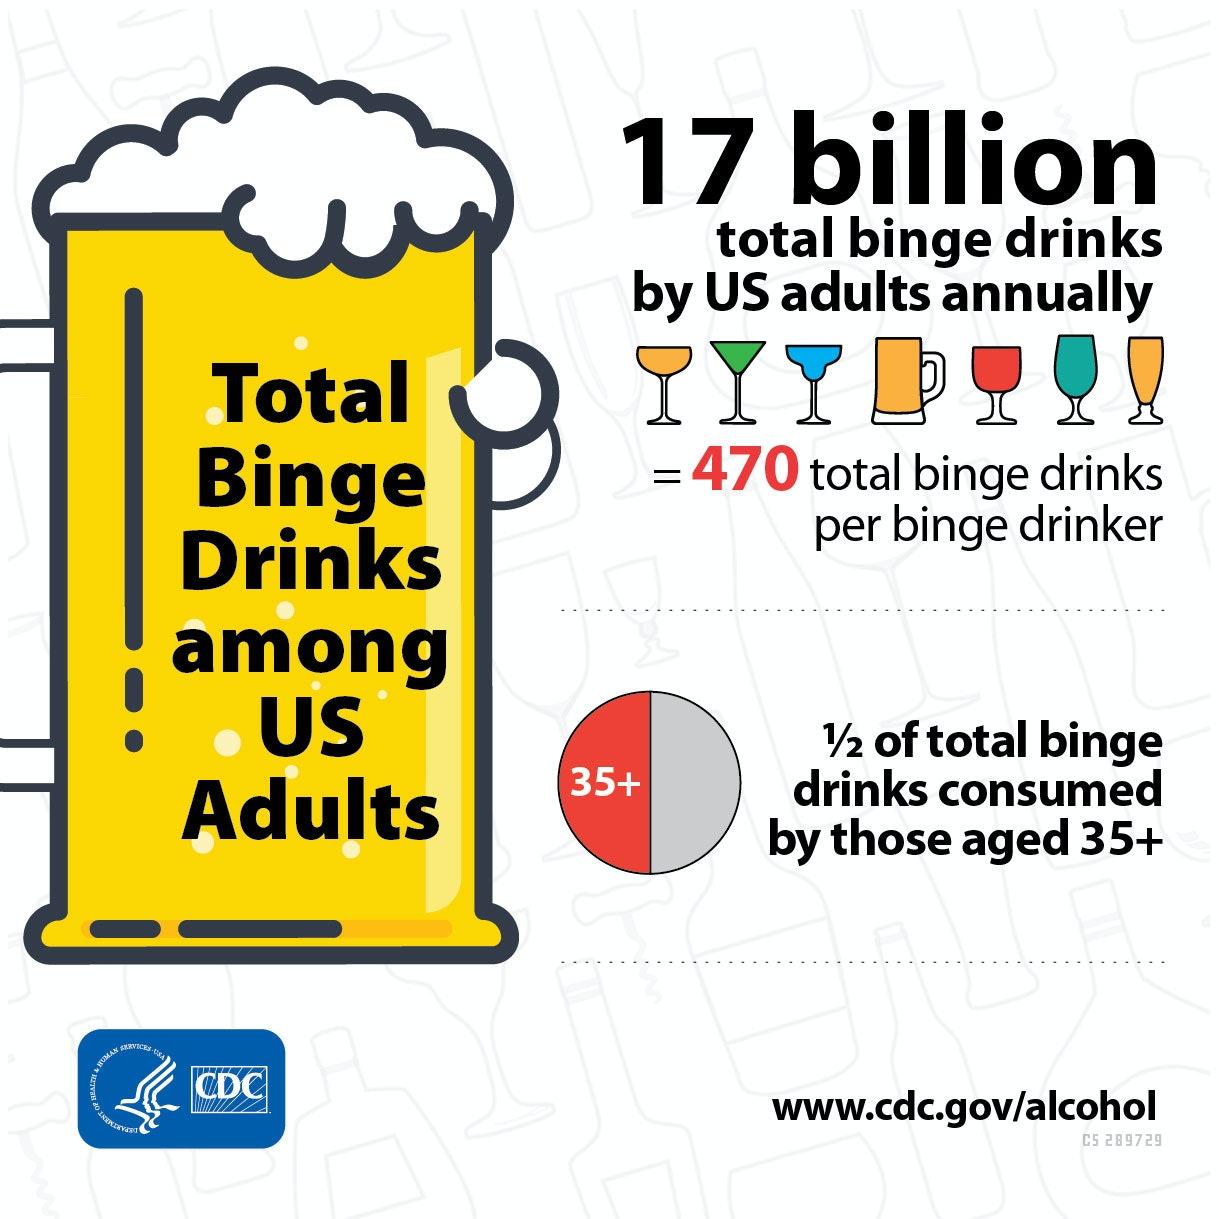 cdc binge drinking statistics 2018